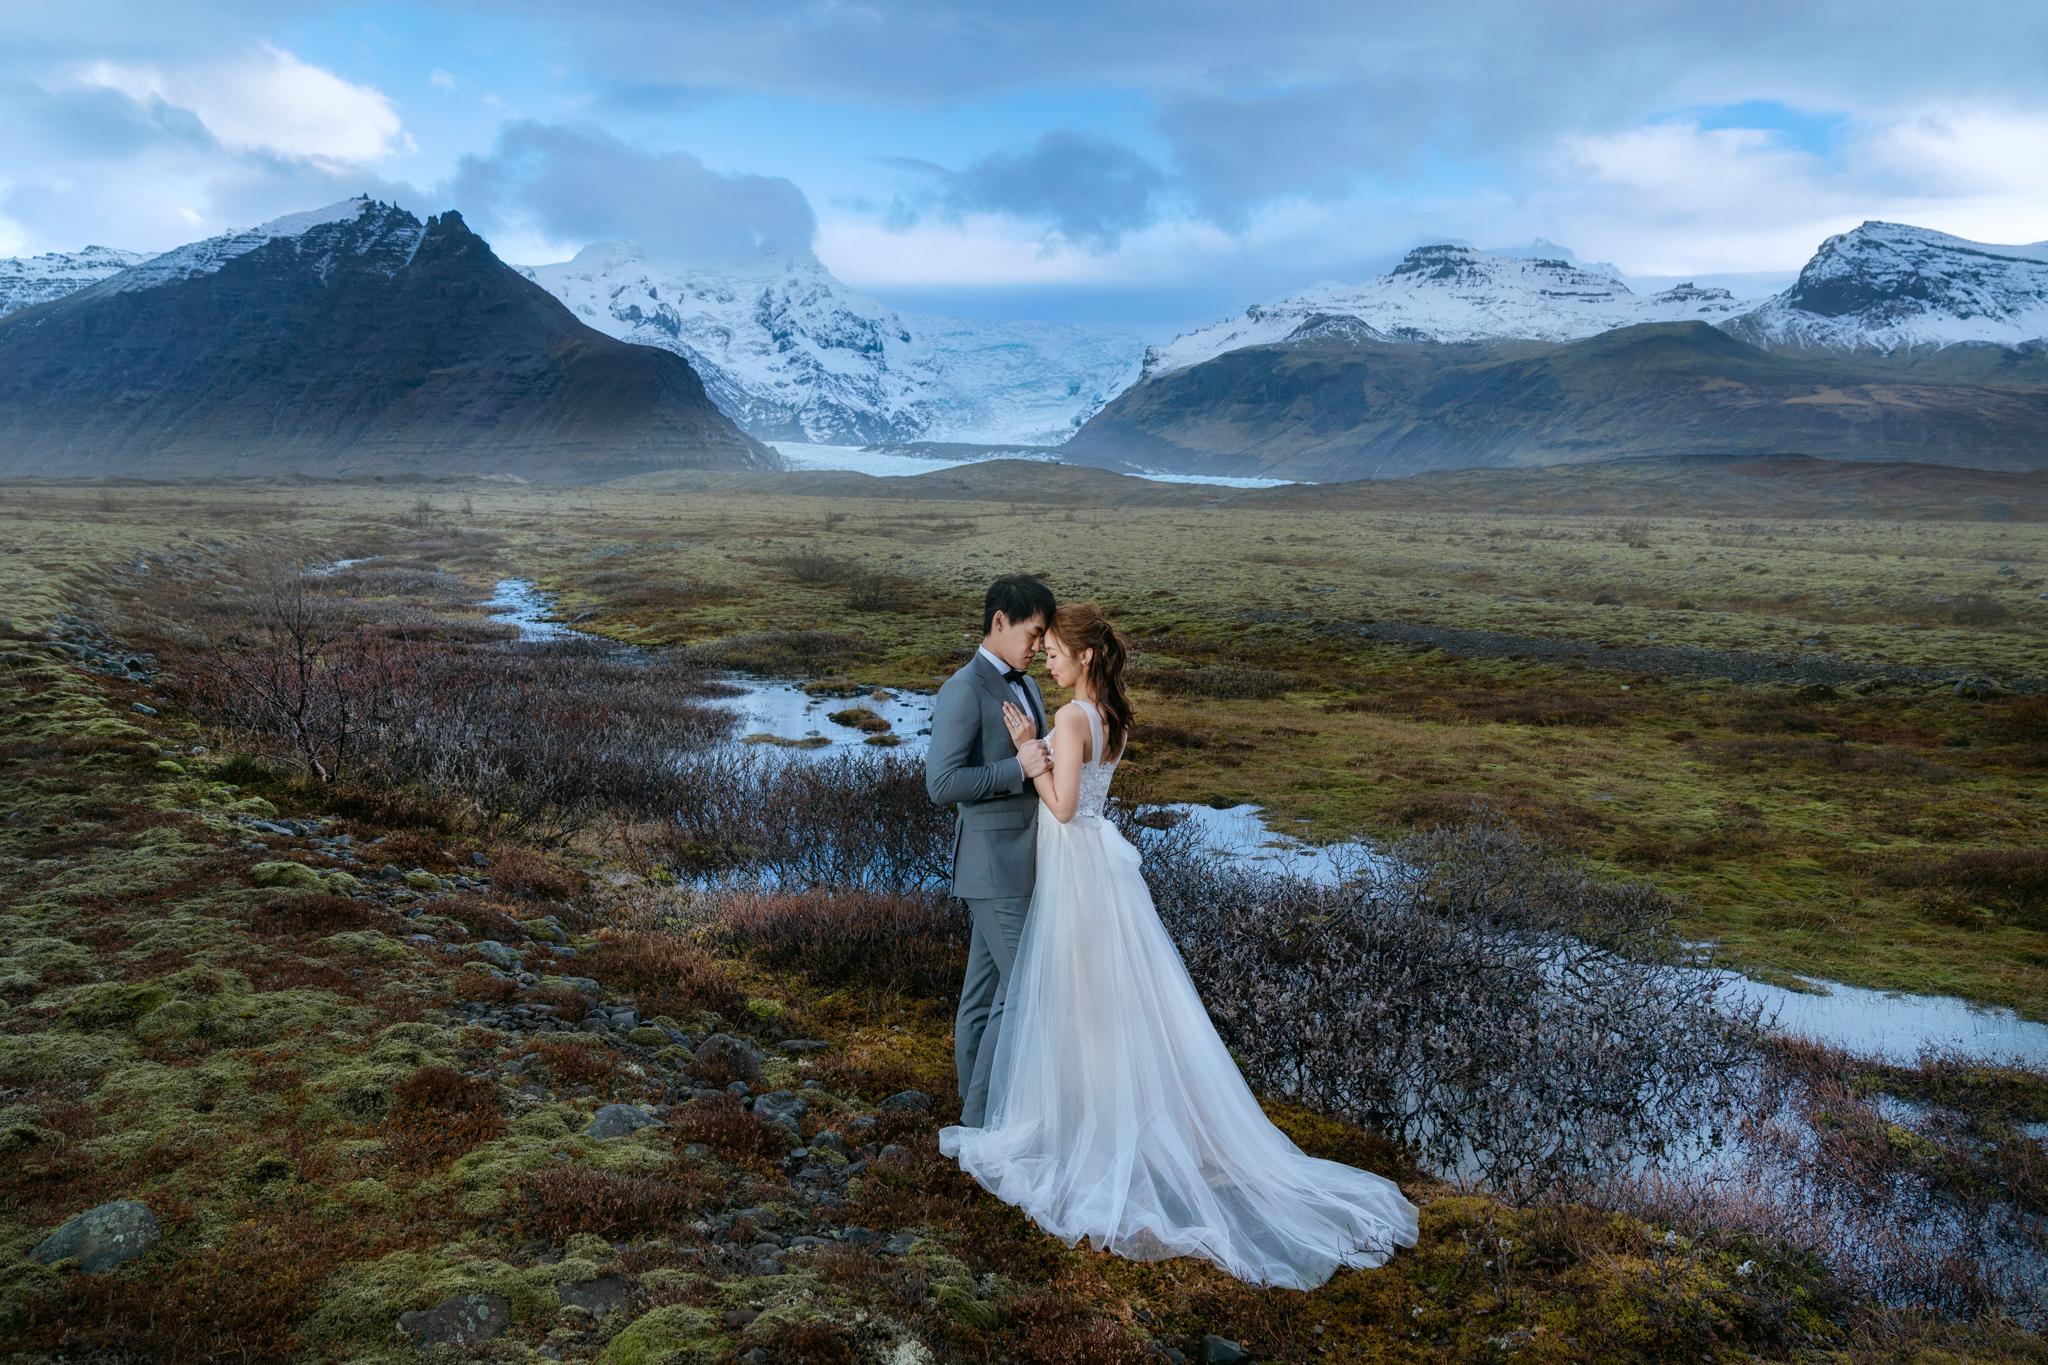 Donfer, EASTERN WEDDING, 冰島婚紗, Iceland, 雷克雅維克, 冰河湖, 冰島馬, 黑沙灘